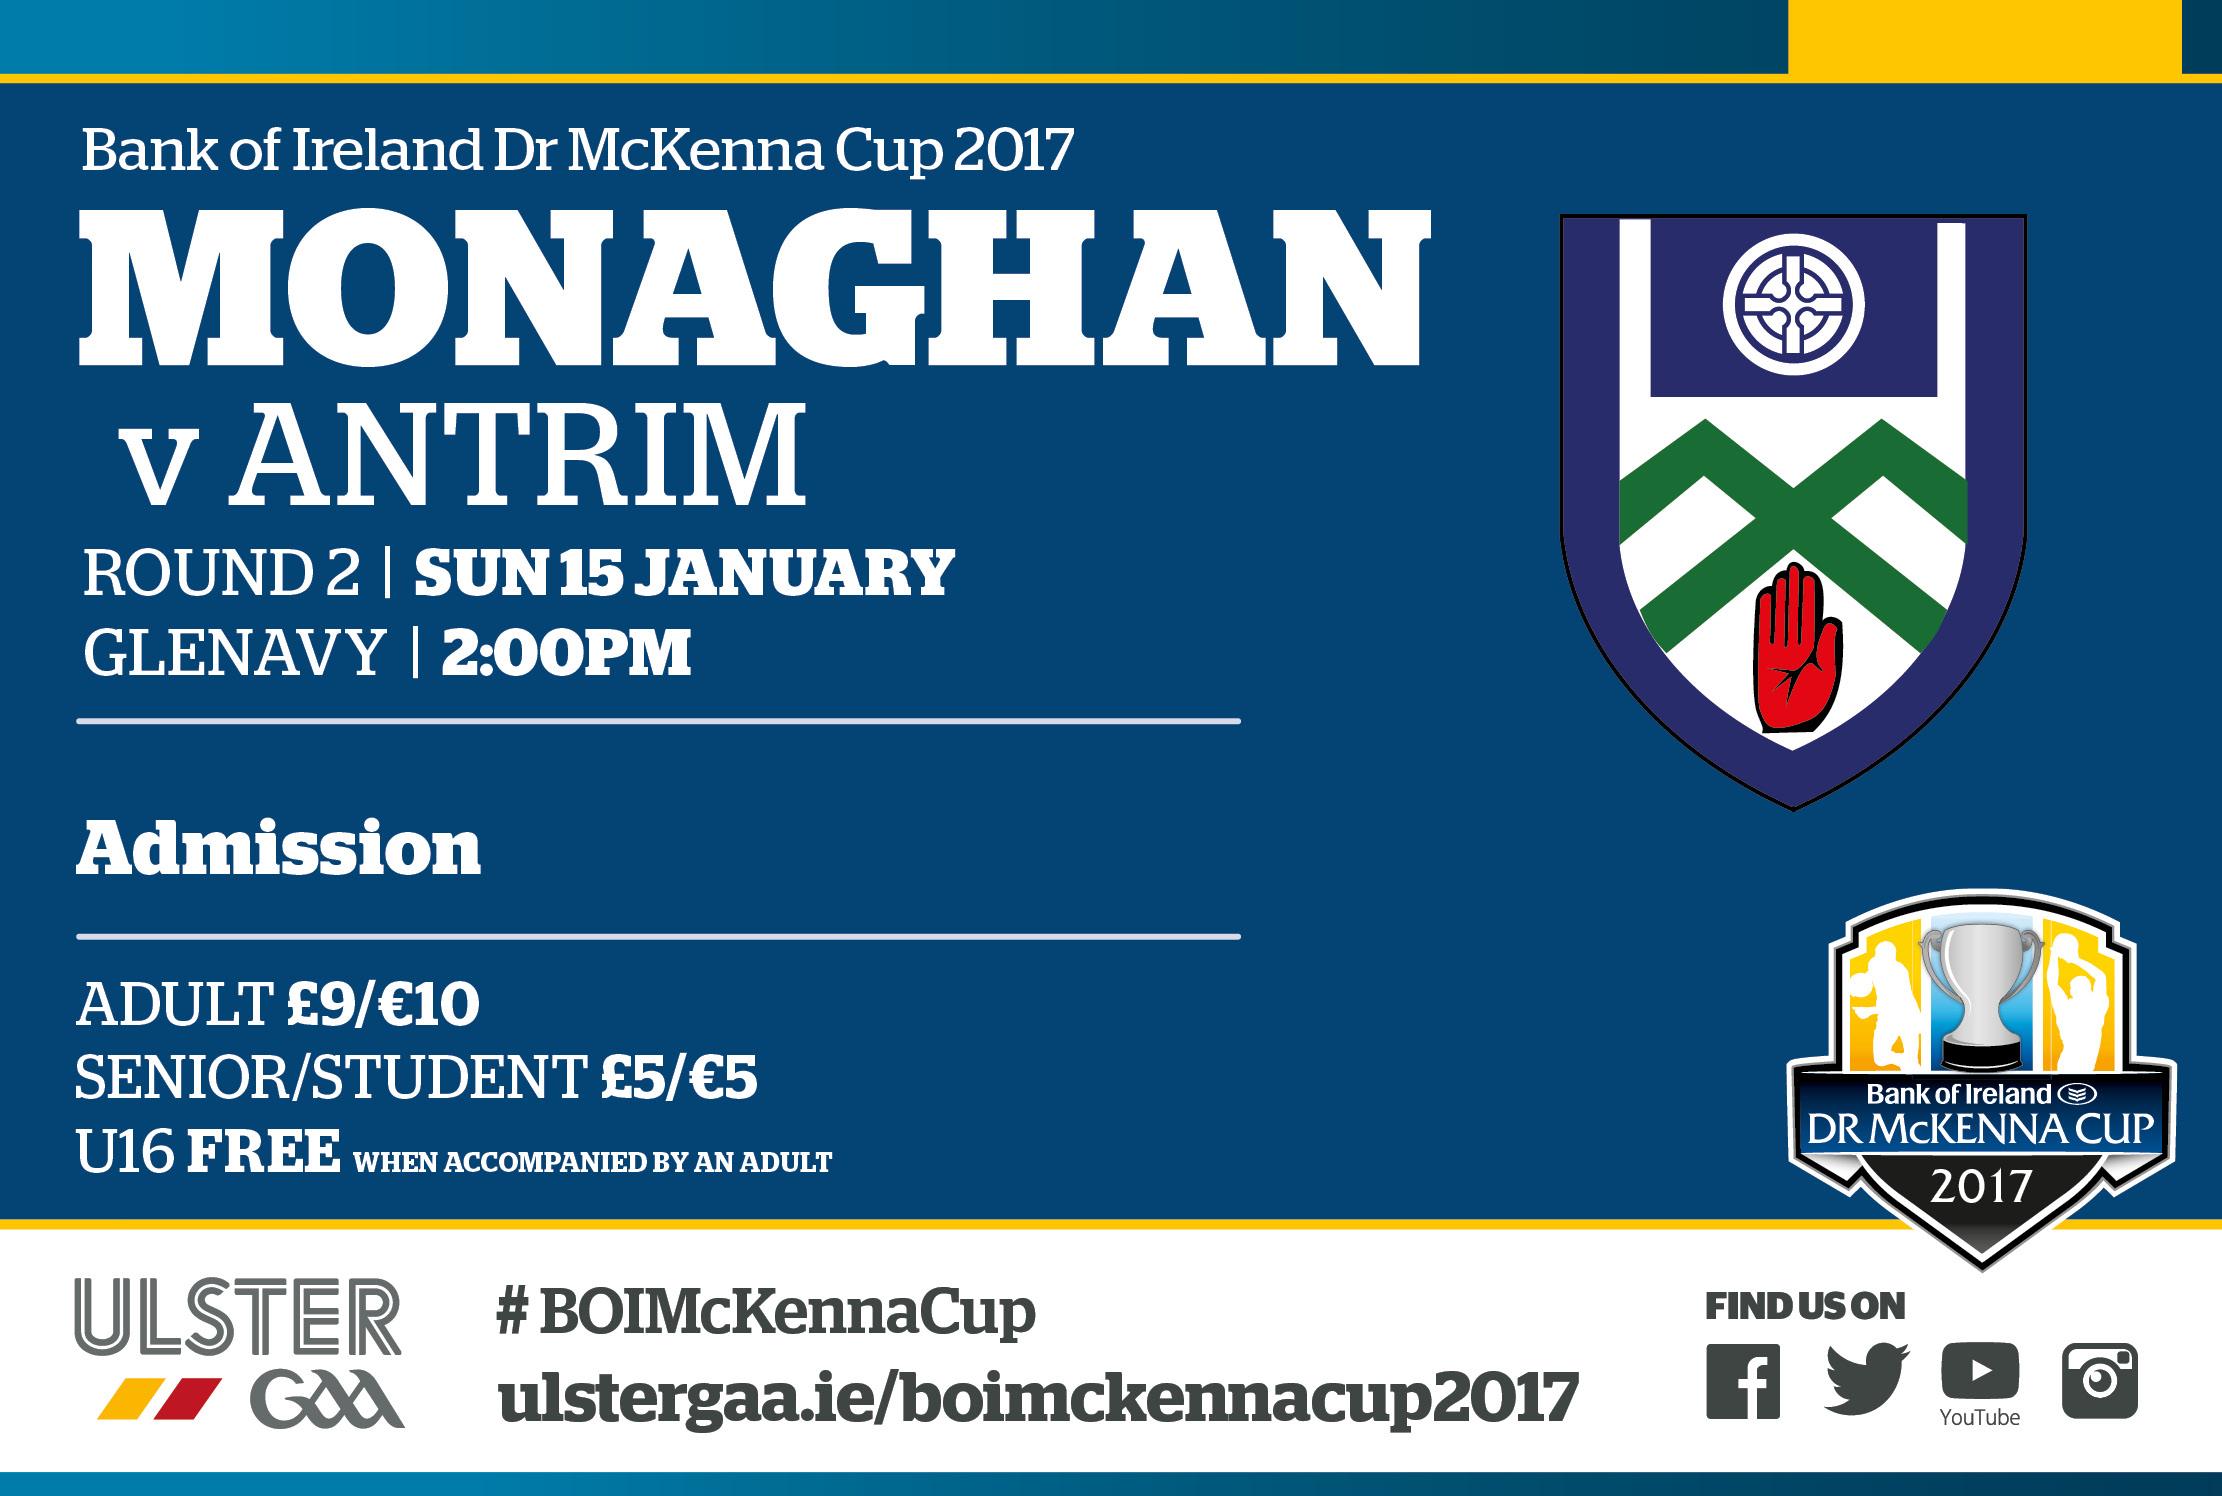 Monaghan Team v Antrim Sunday 15th January